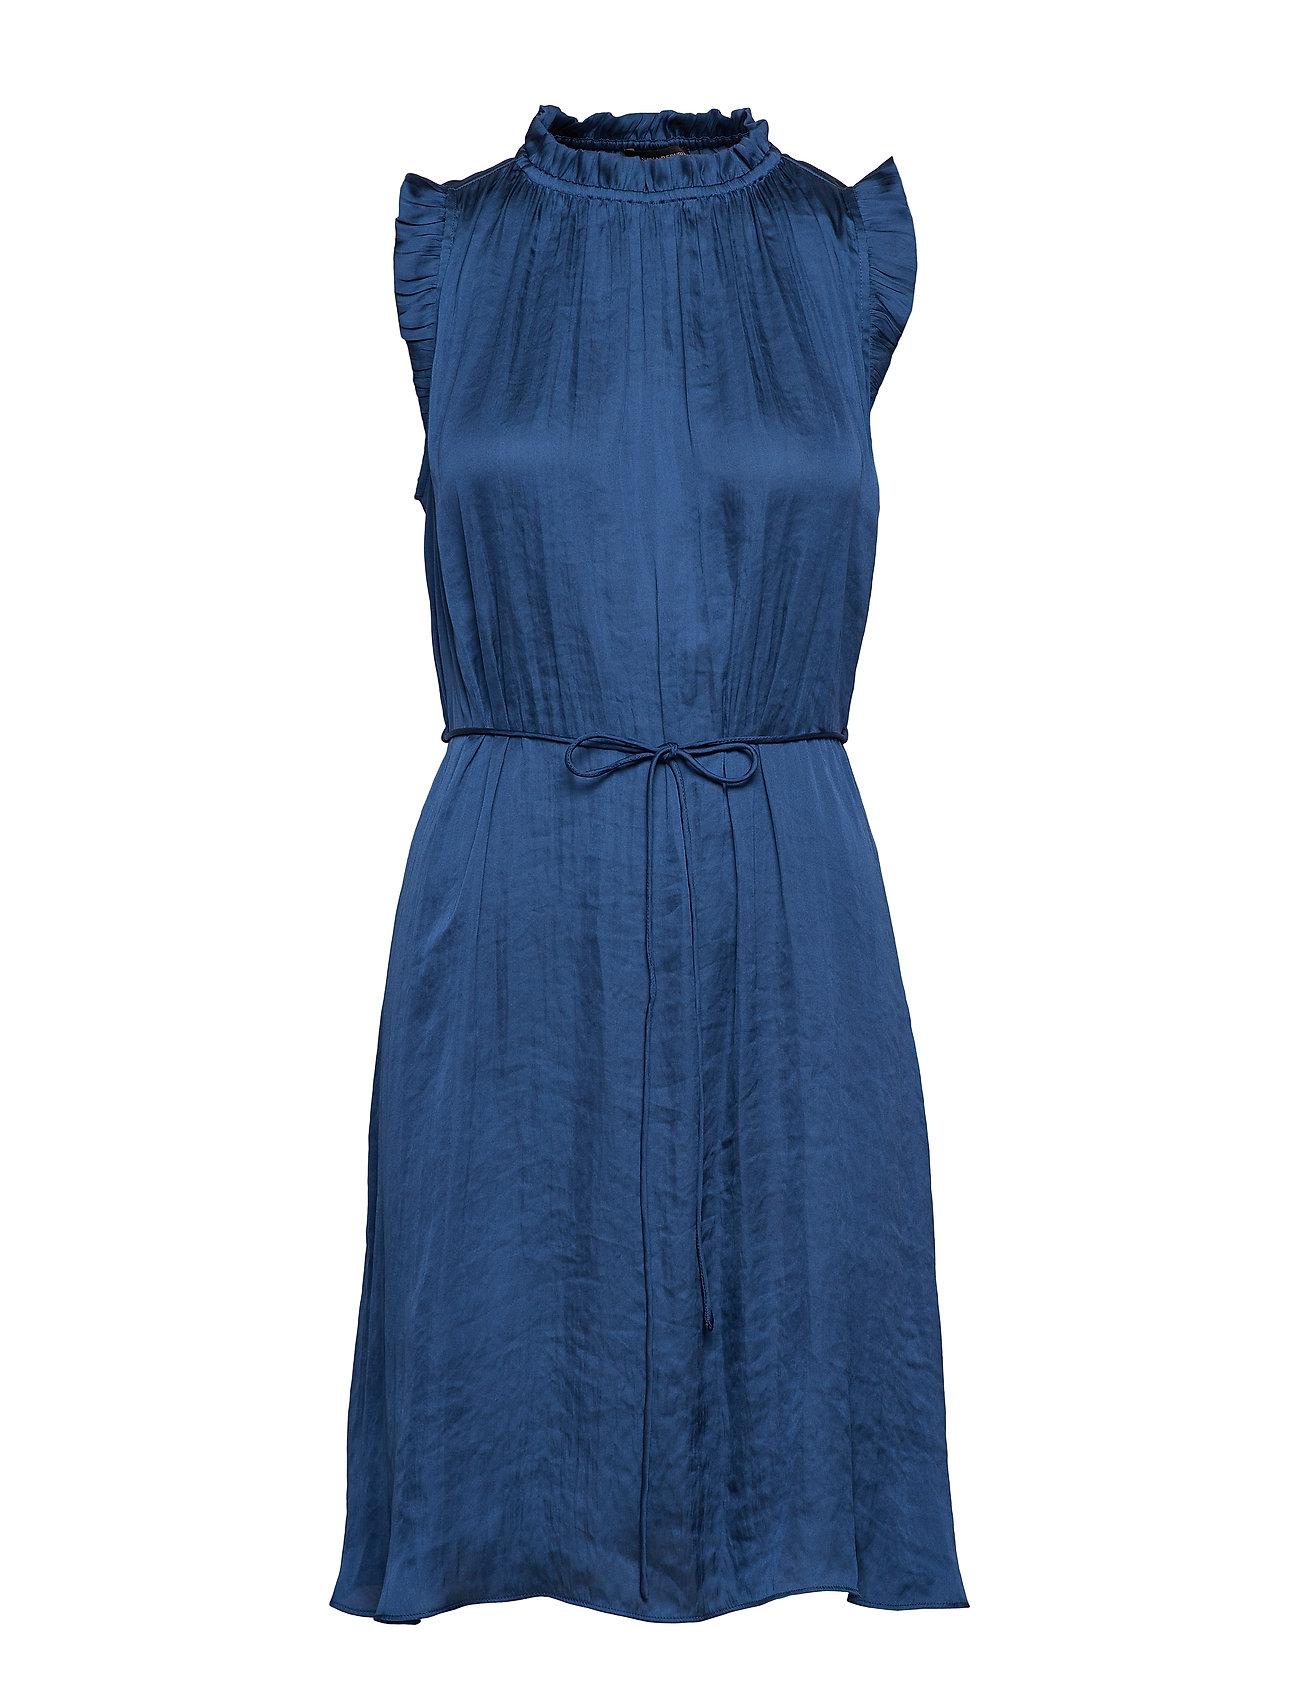 Banana Republic Soft Satin Ruffled Dress - INDIGO FOG GLOBAL